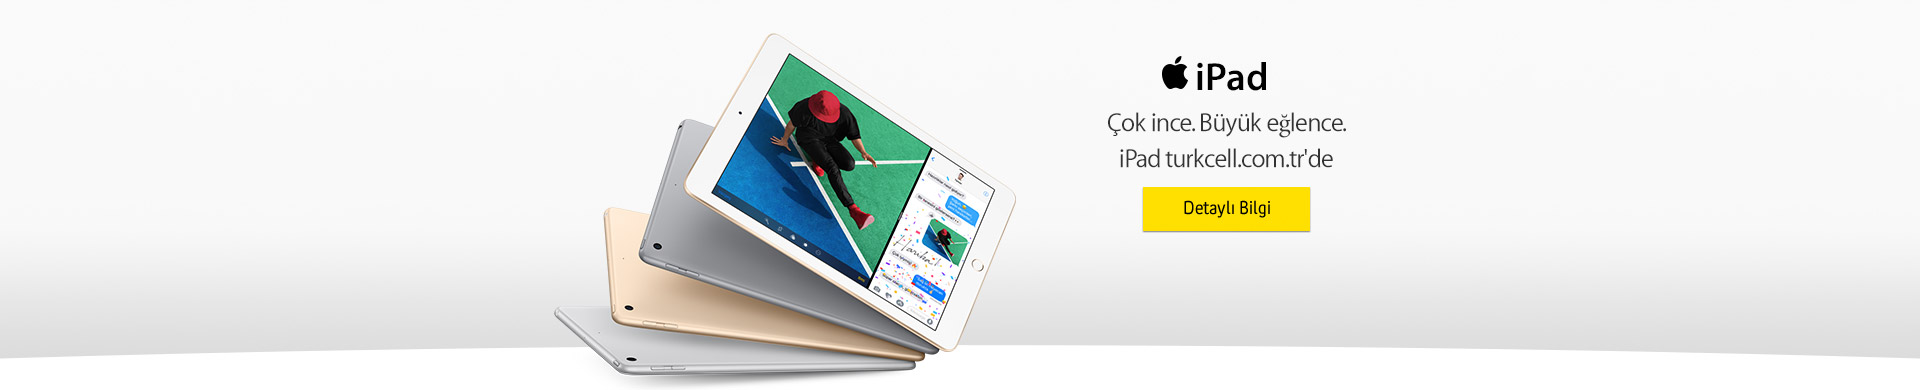 Çok ince. Büyük Eğlence. iPad turkcell.com.tr'de